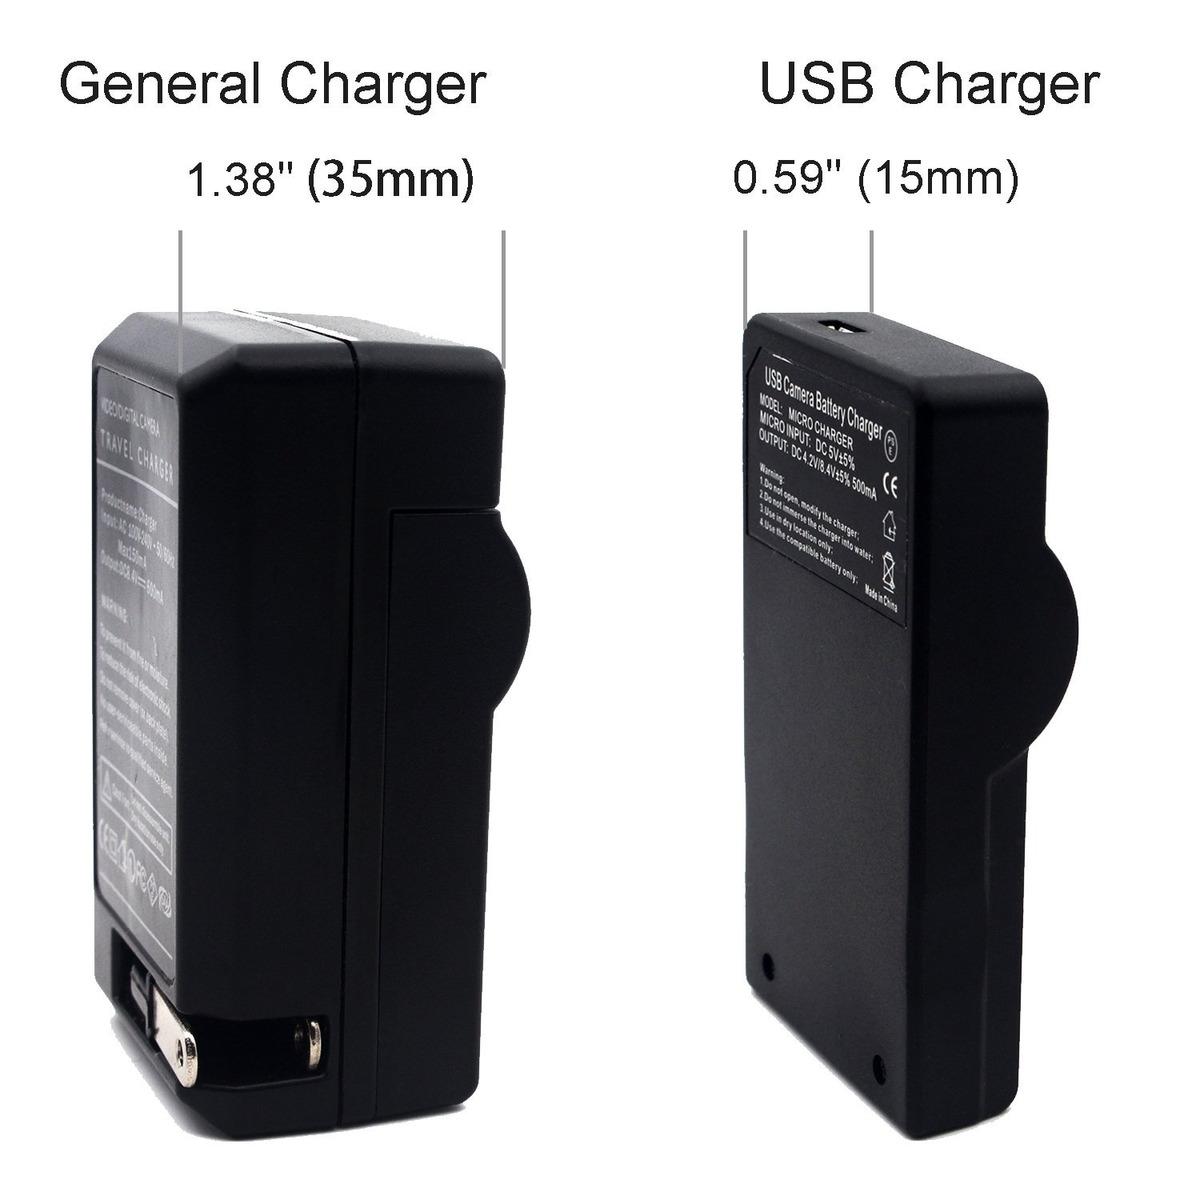 DMC-FZ2 Micro USB Cargador para Panasonic Lumix DMC-FZ1 FZ1B